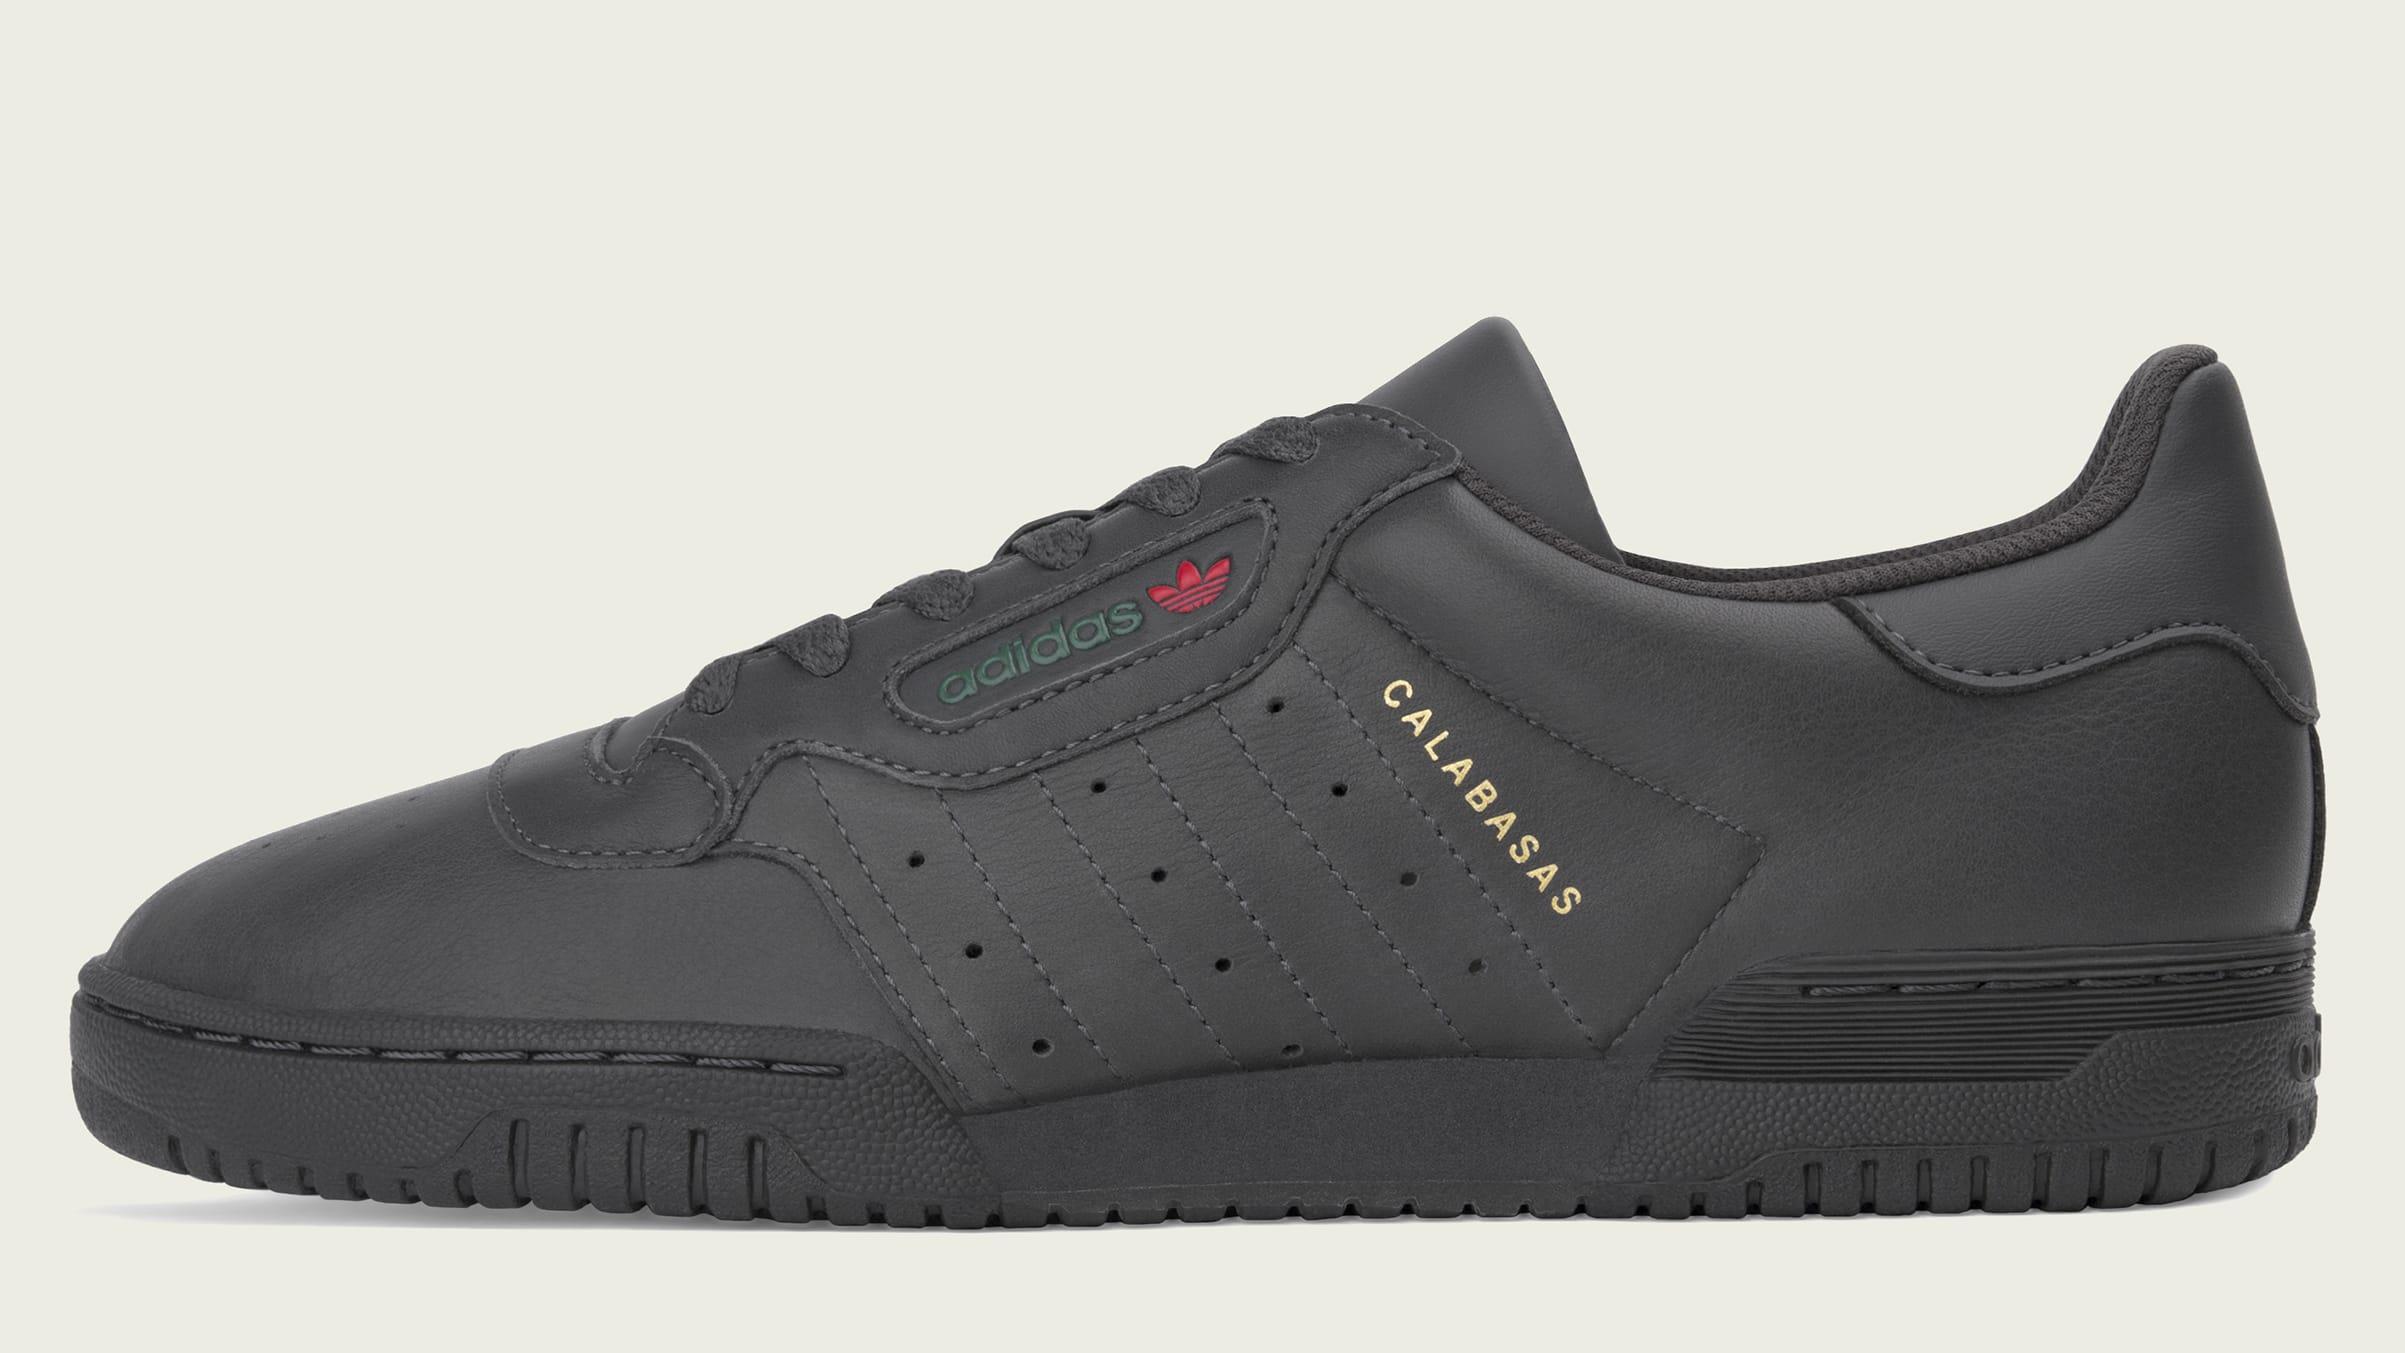 Adidas Yeezy Powerphase 'Core Black' CG6420 (Left)